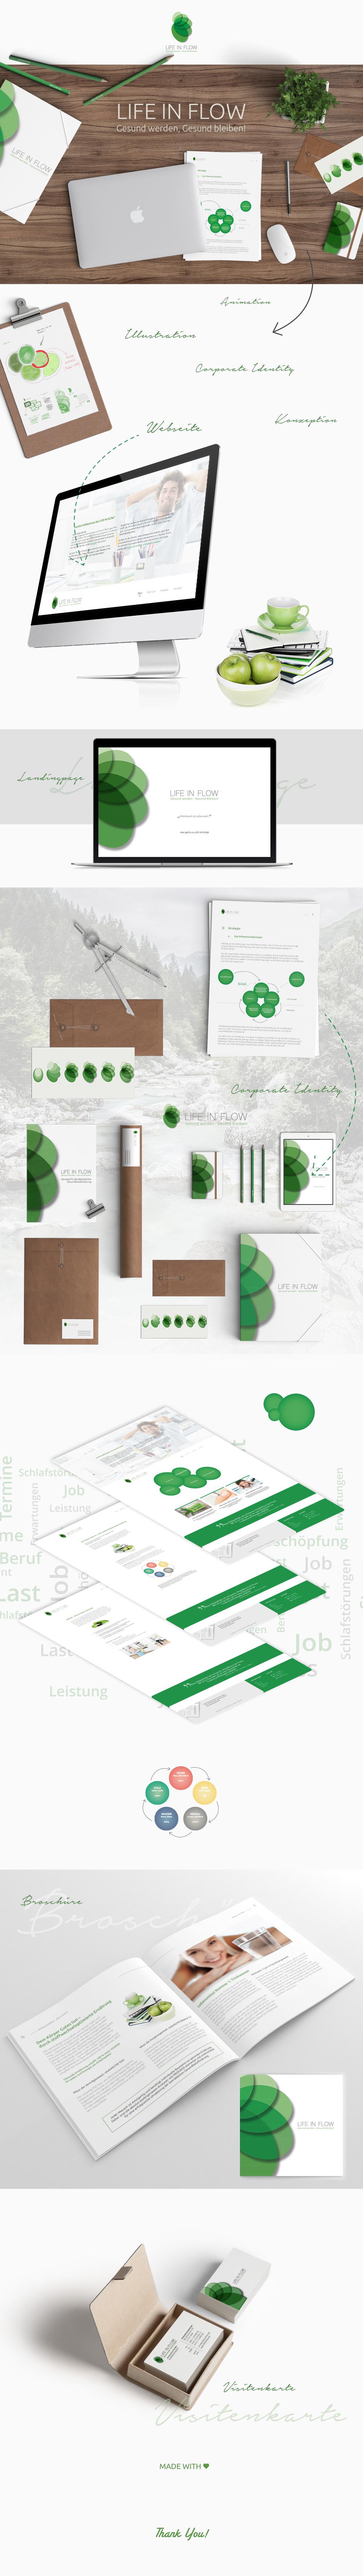 Corporate Identity editorial Webdesign logodesign scribble broschure visitenkarte Webseite Konzeptdesign